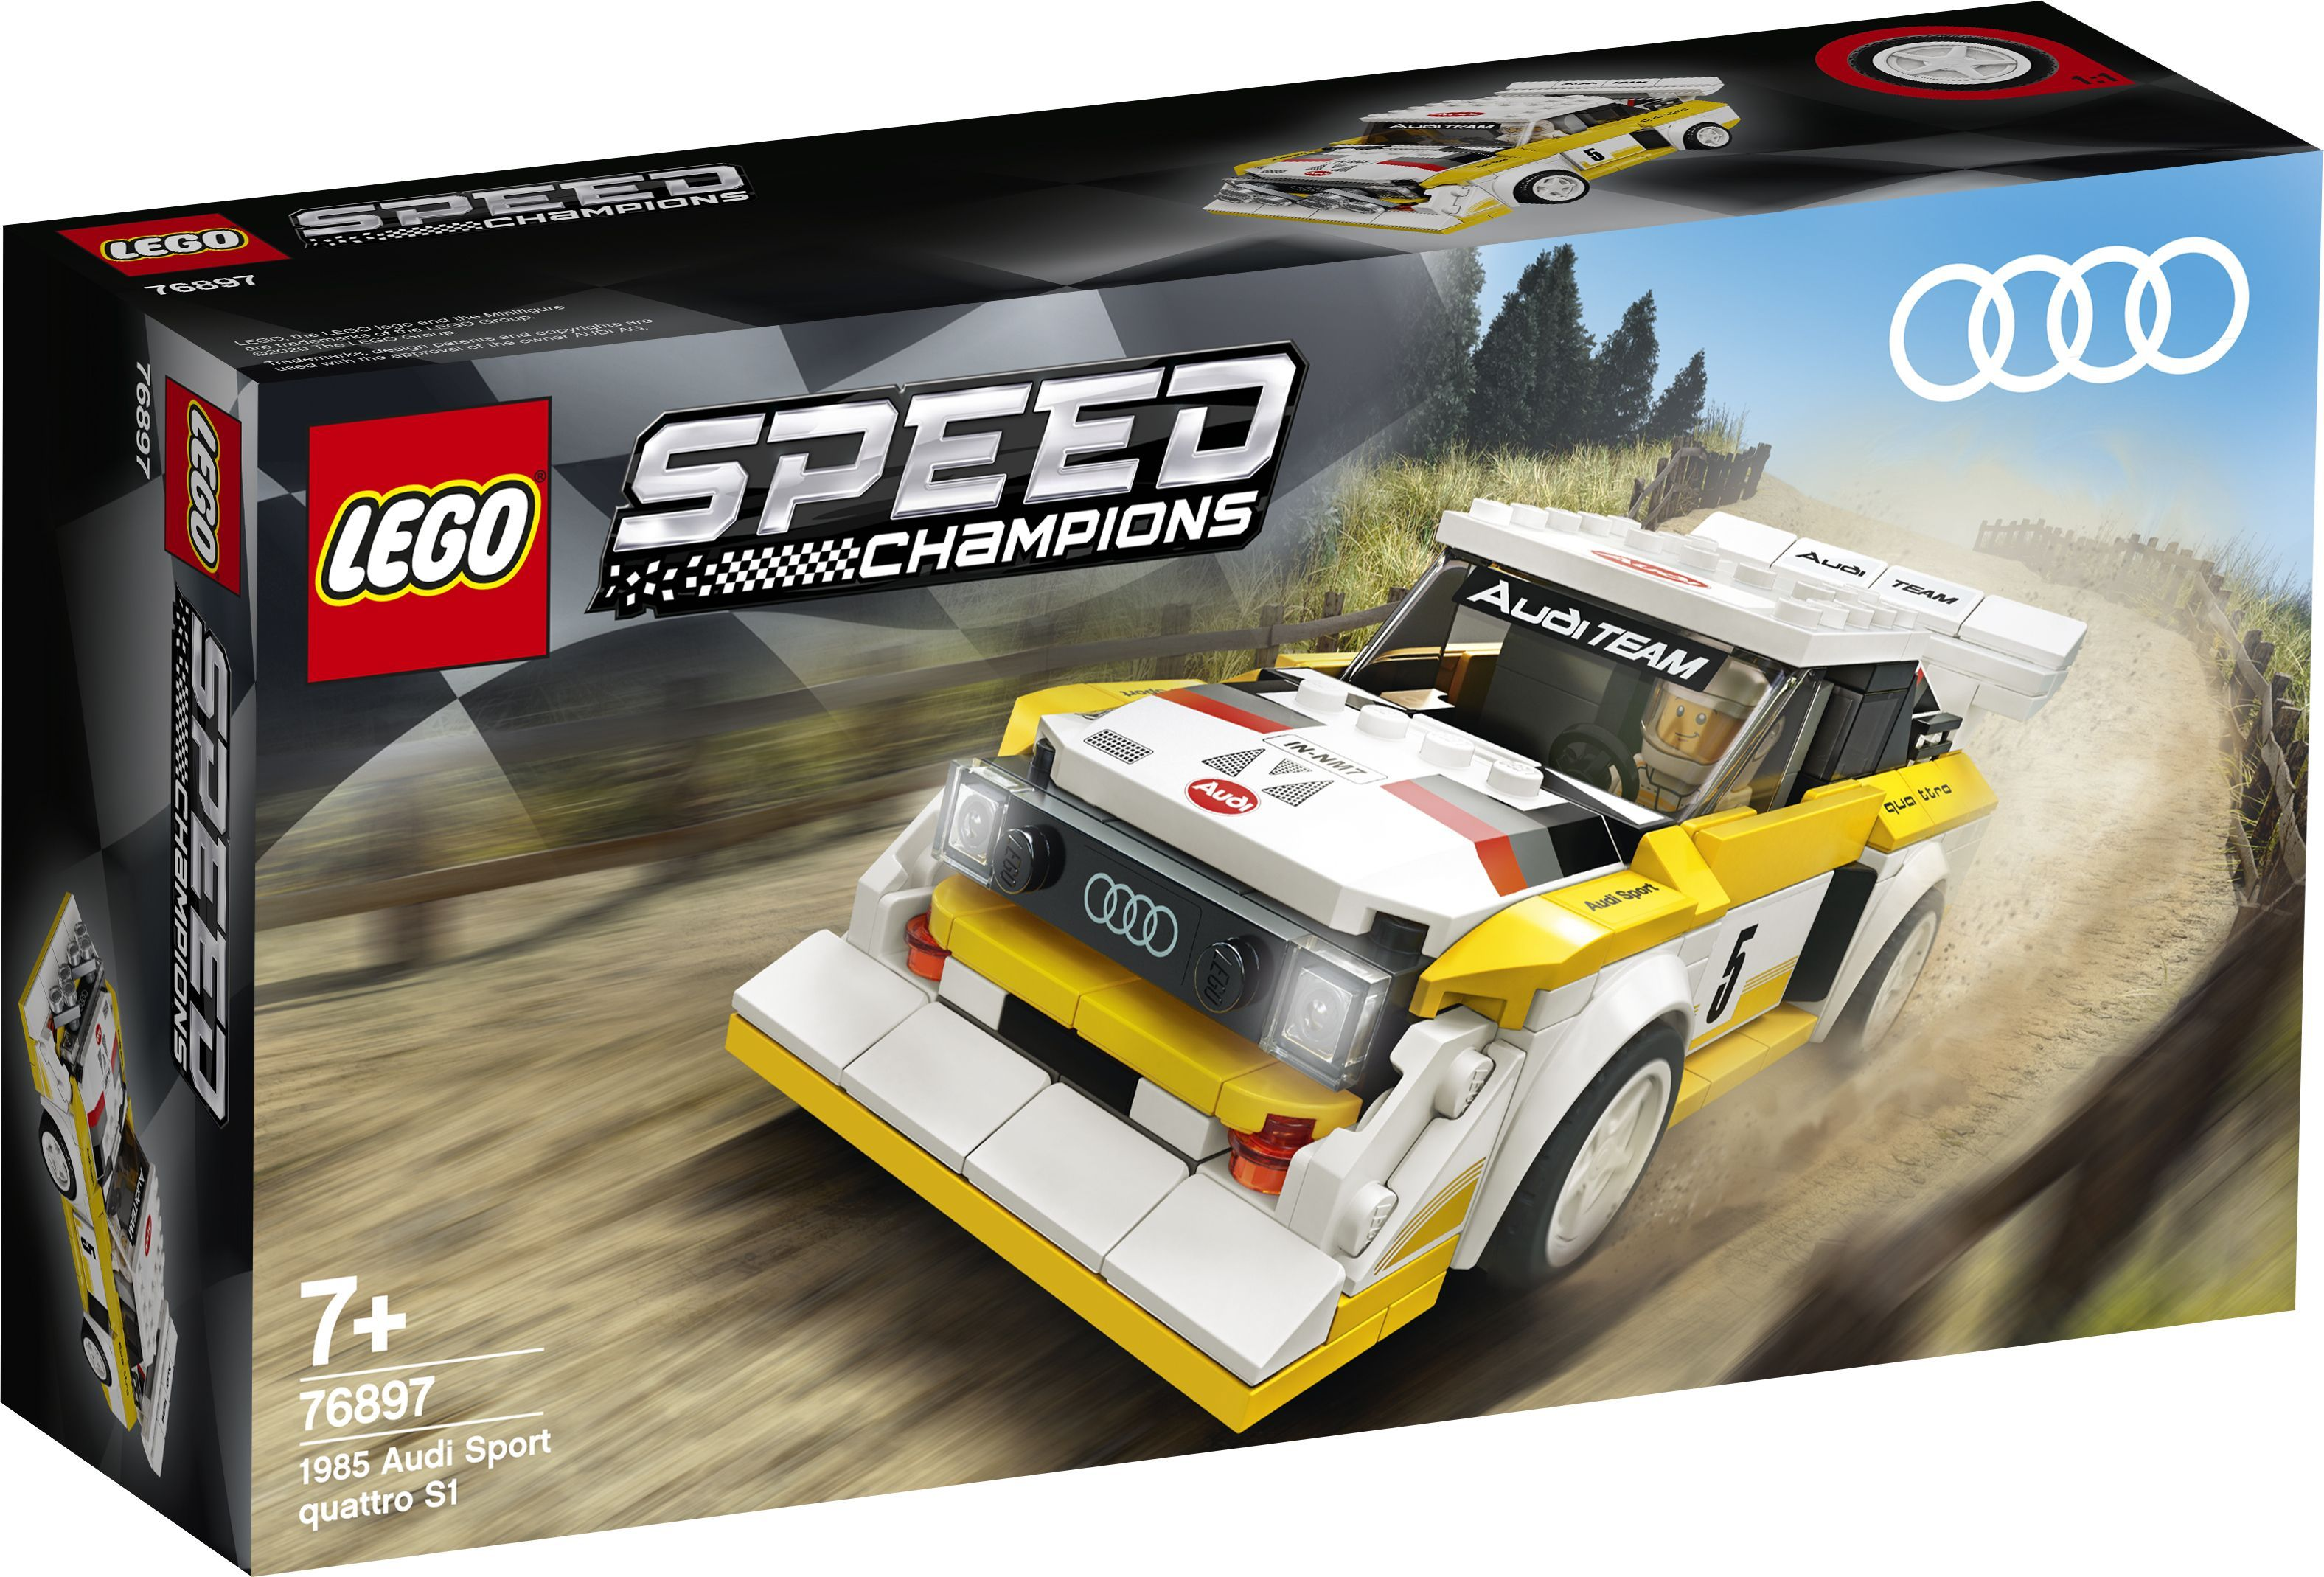 Audi Sport Quattro S1, Ferrari F8 Tributo Become Lego Speed Champions Sets